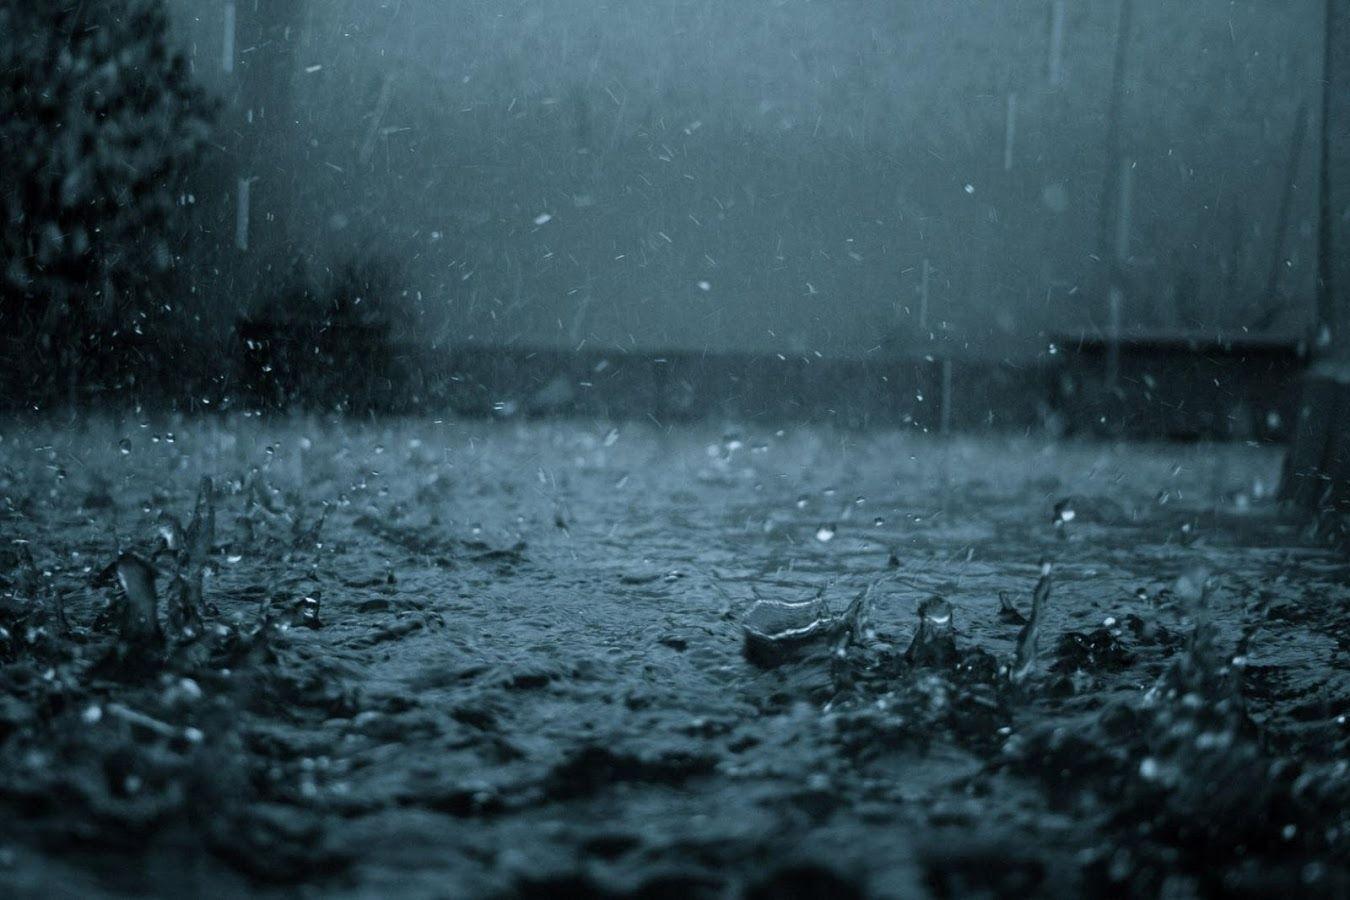 Rain 4k Wallpapers Top Free Rain 4k Backgrounds Wallpaperaccess